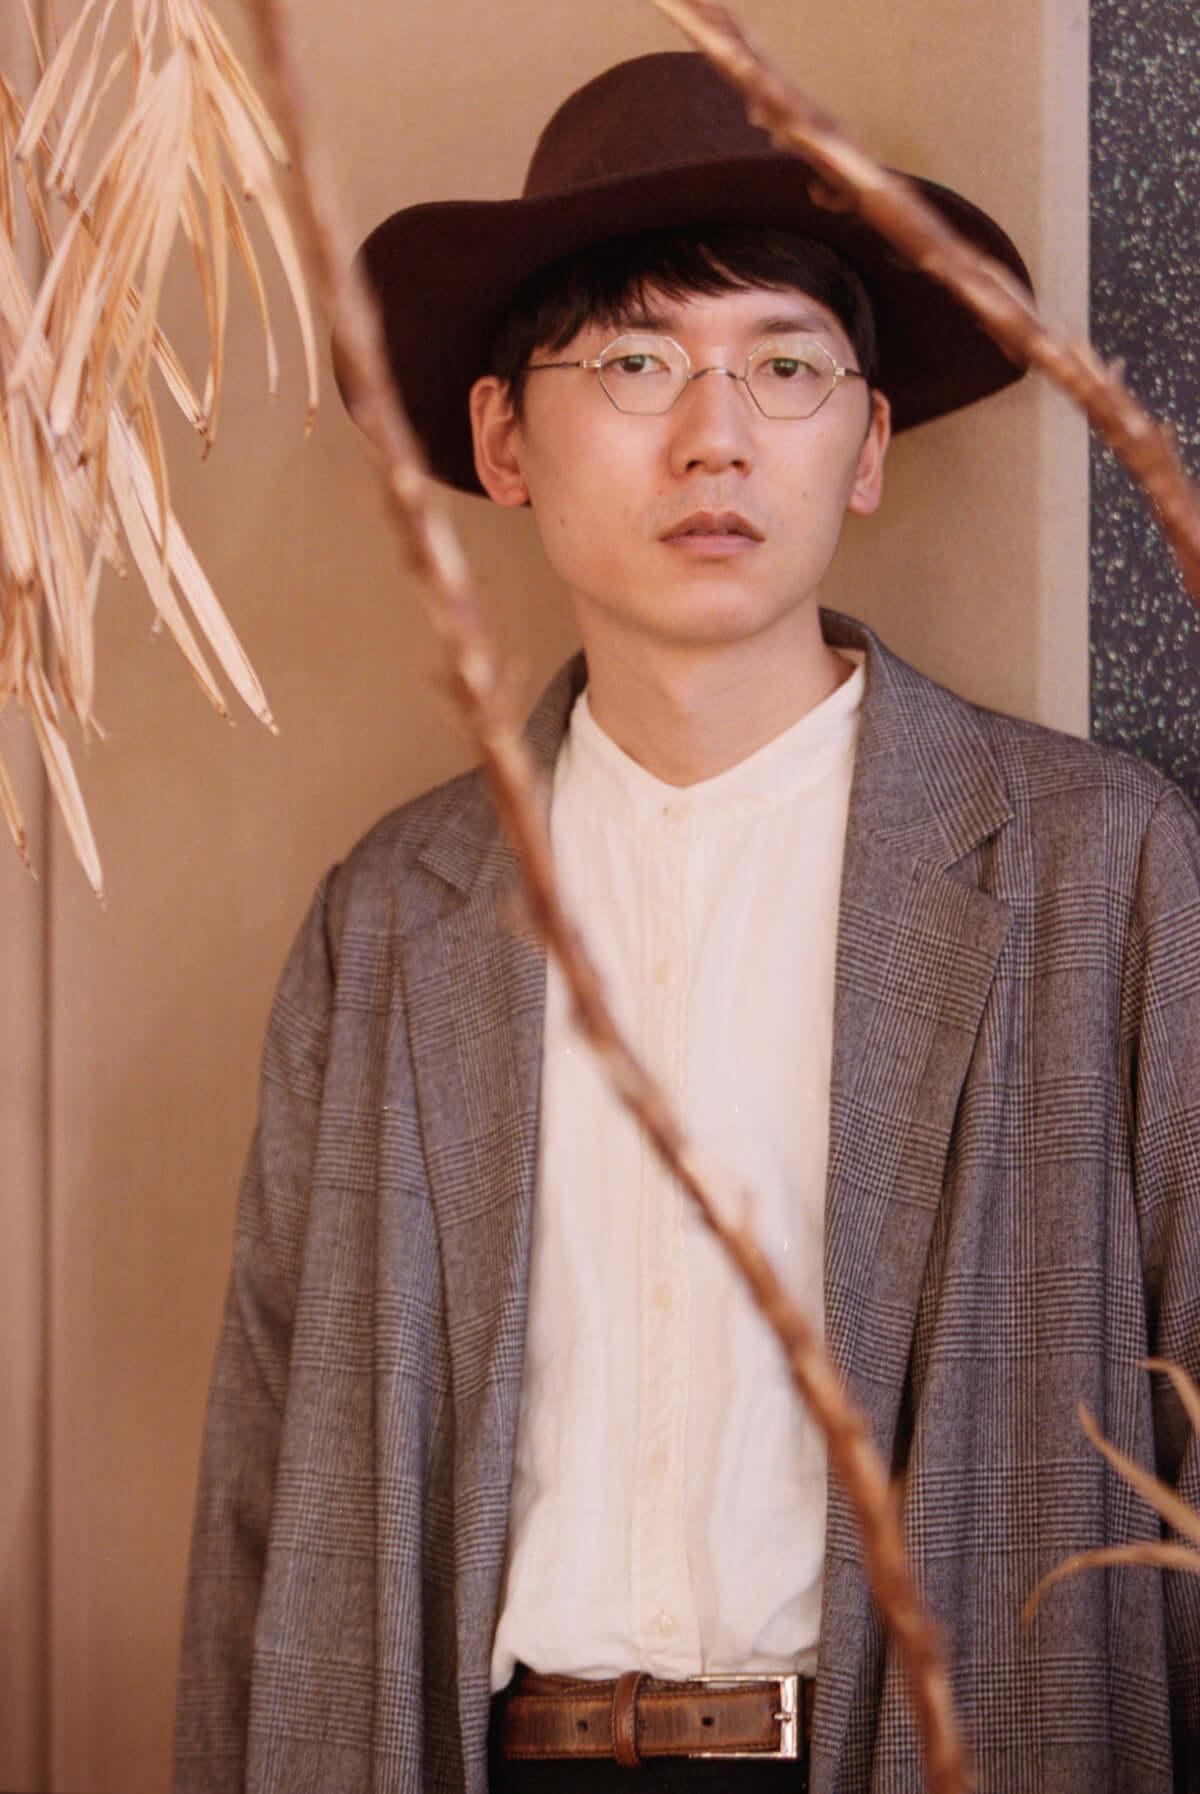 Kan Sano、待望の4thアルバム『Ghost notes』5月22日リリース決定! music190416_kansano_2-1200x1794